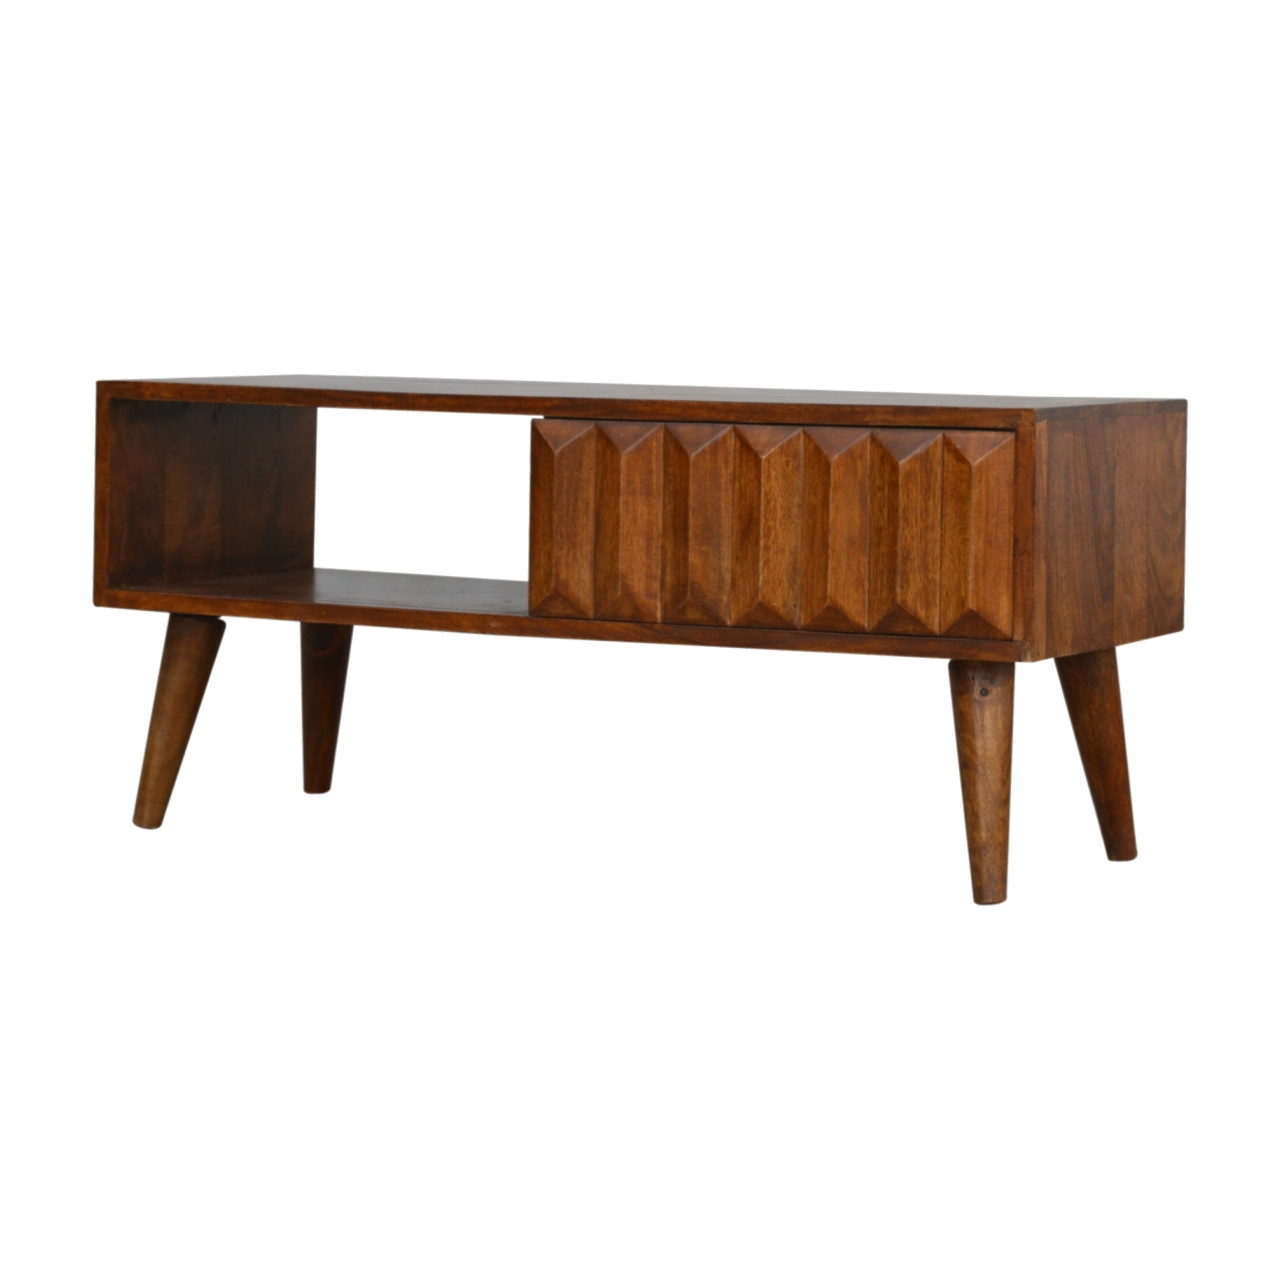 IN695-Chestnut-Prism-Sliding-Door-Coffee-Table-3